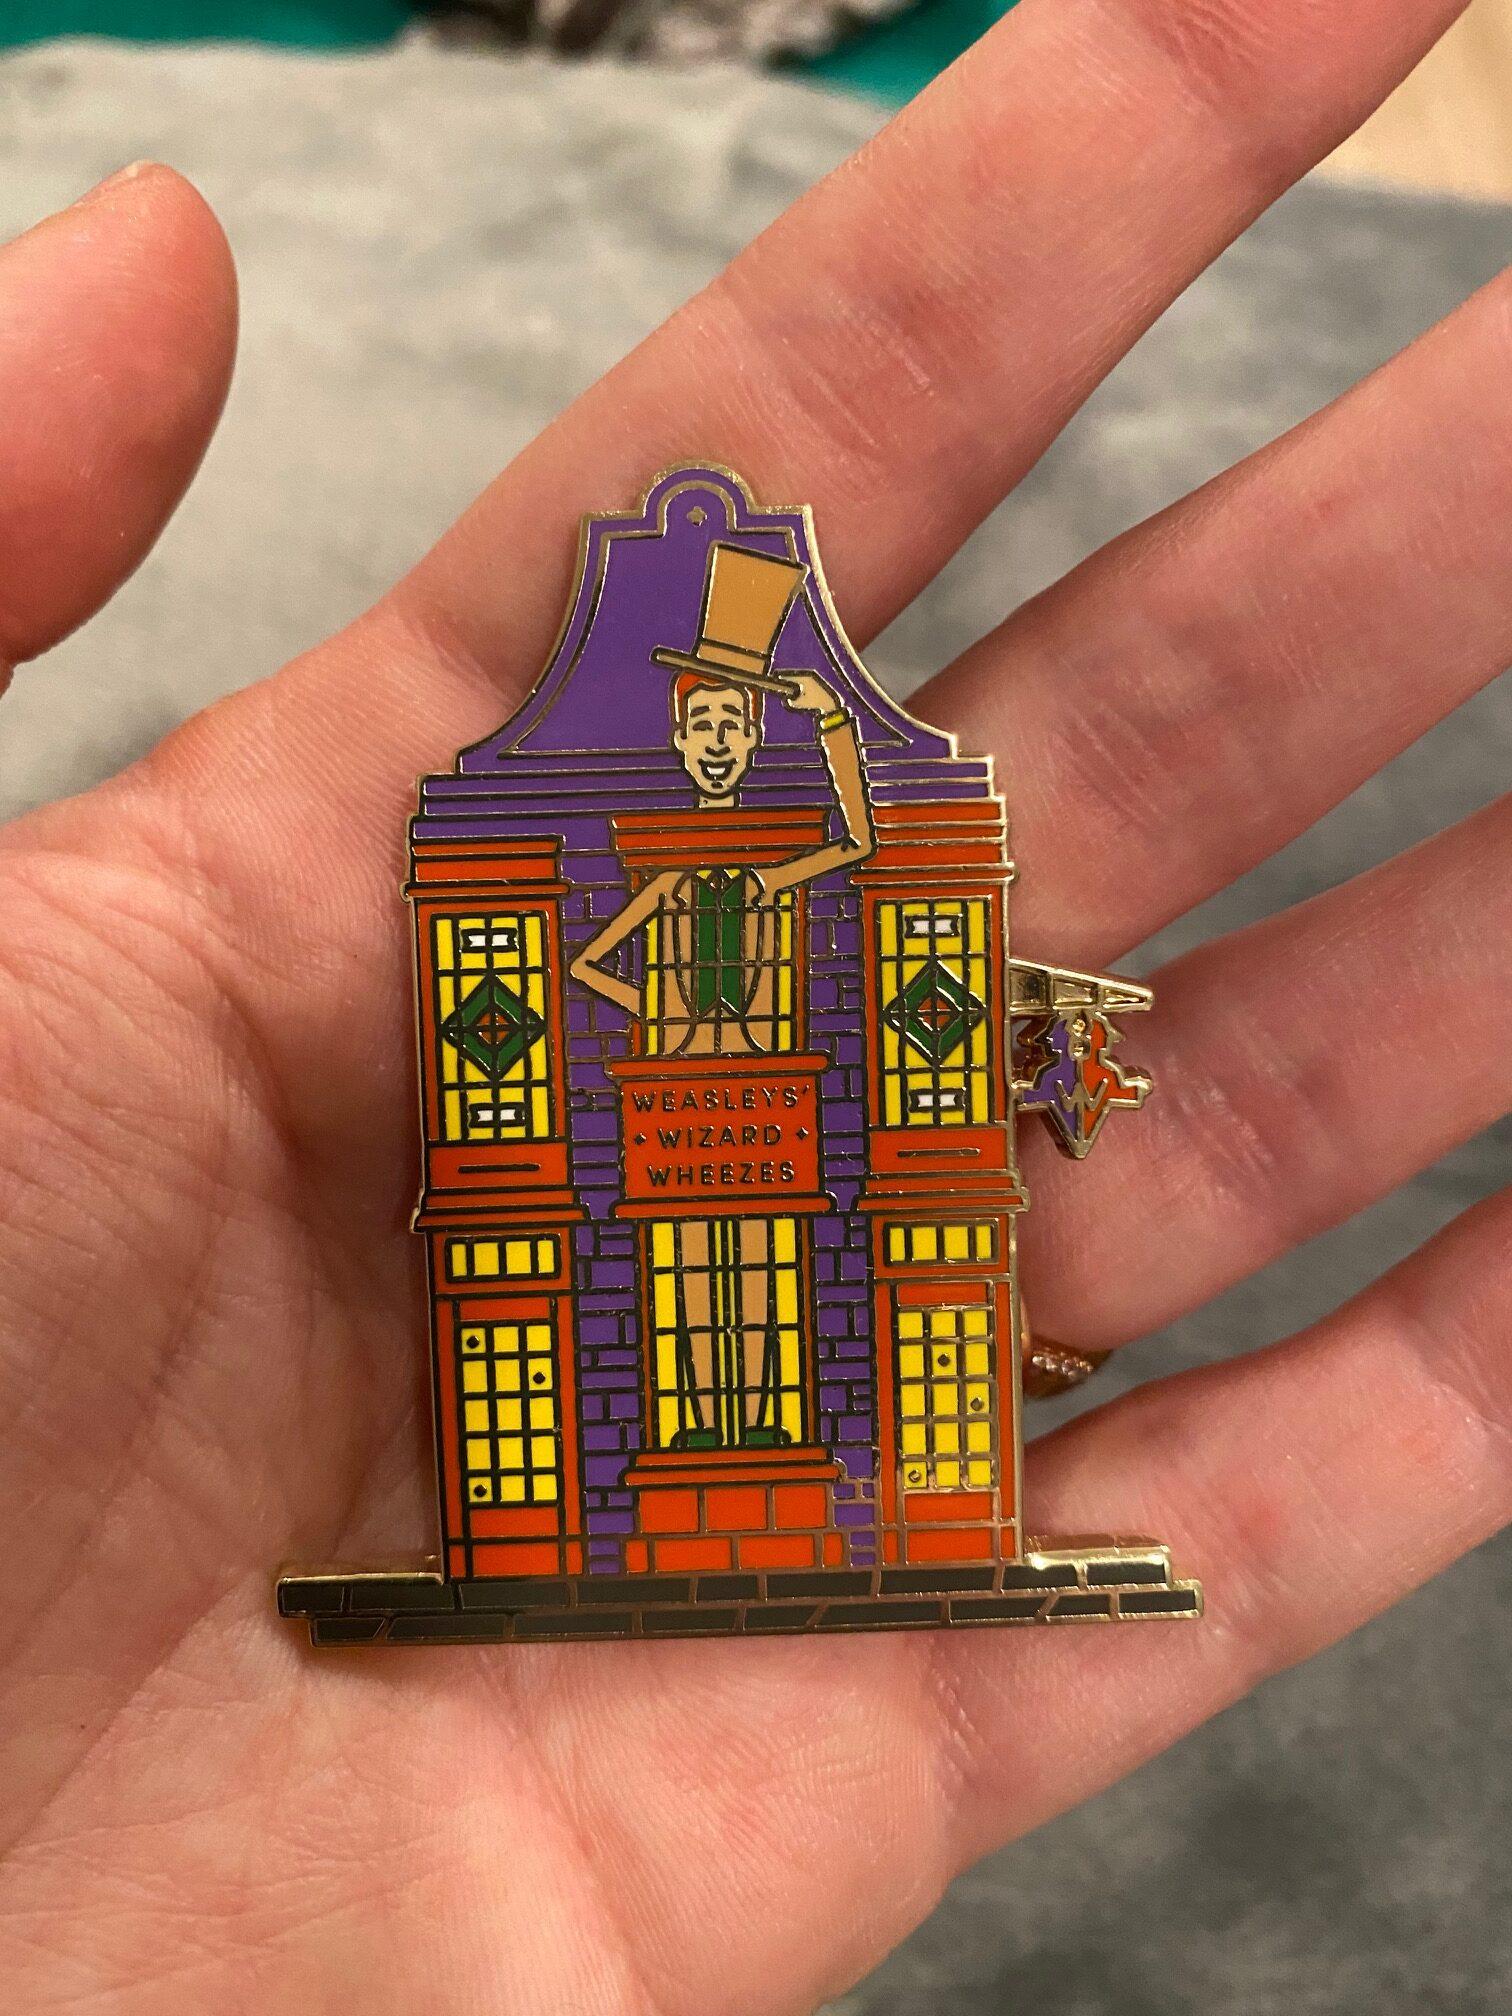 Weasleys' Wizard Wheezes Pin